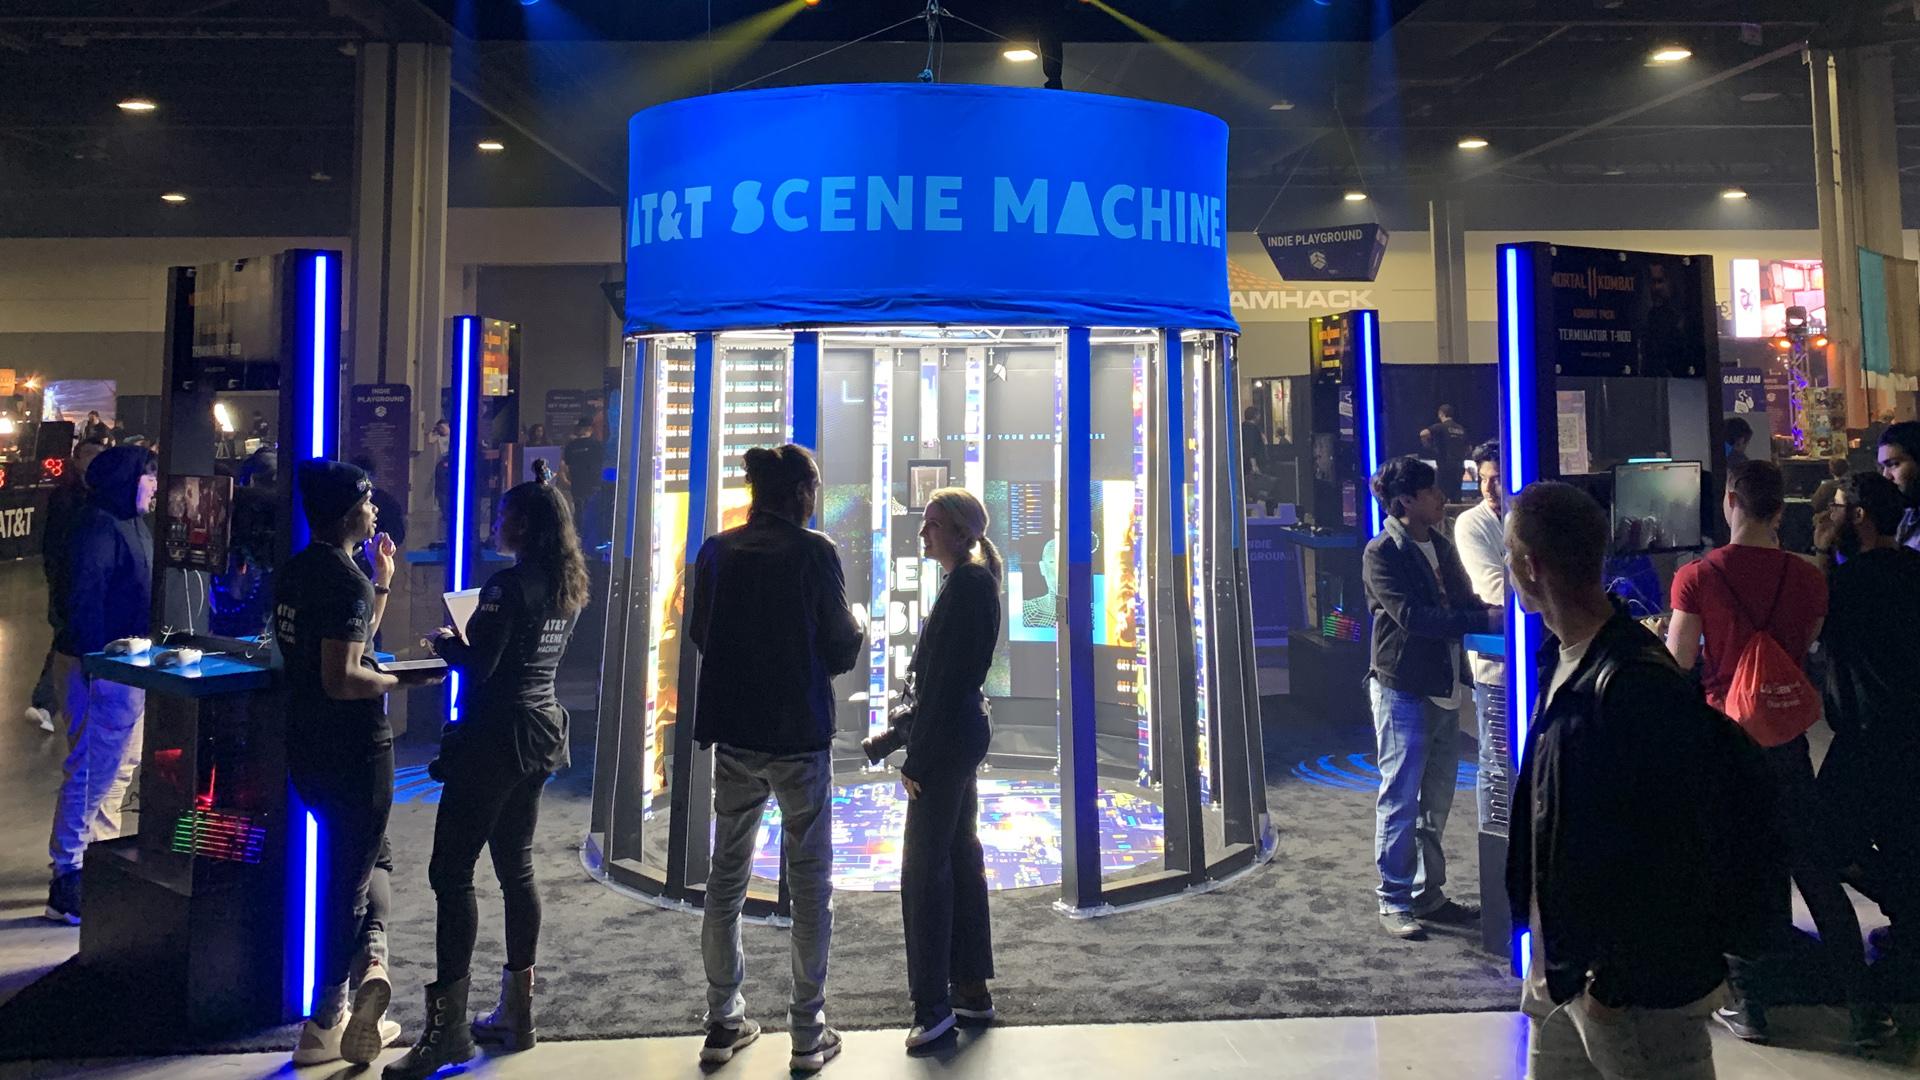 AT&T Scene Machine